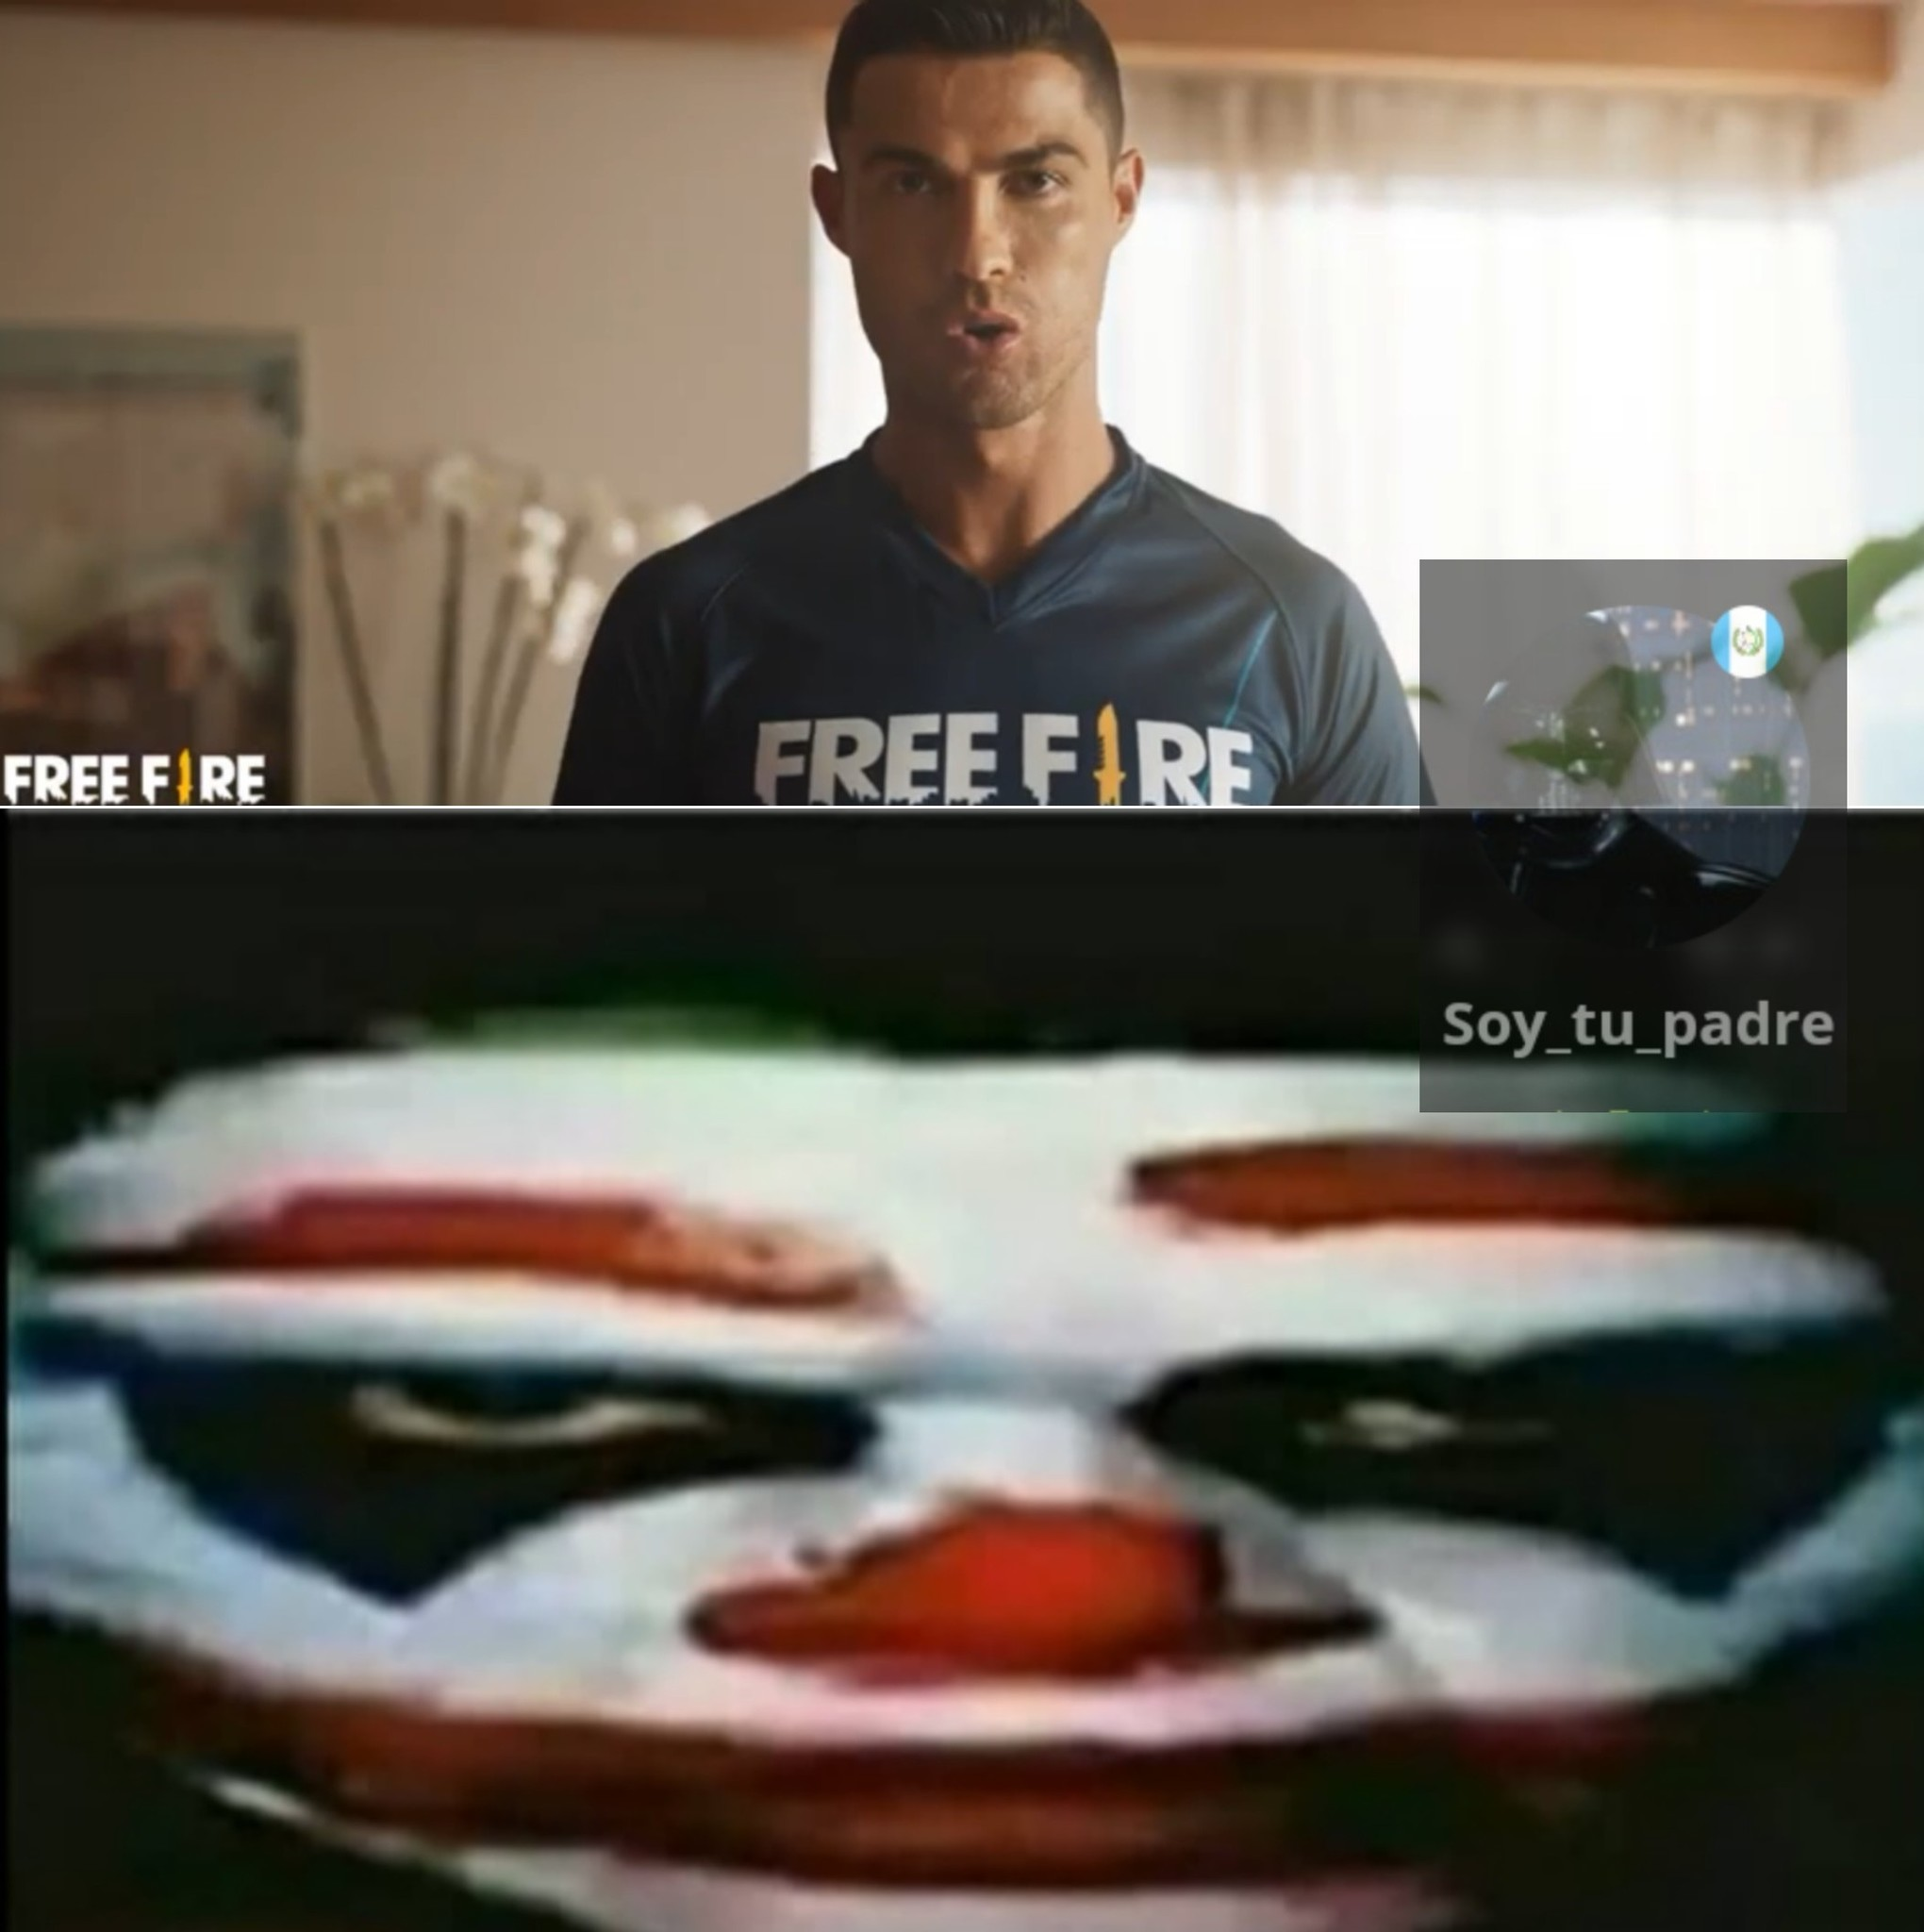 Me pareció chistoso ver al serresiete en un anuncio de free fire - meme